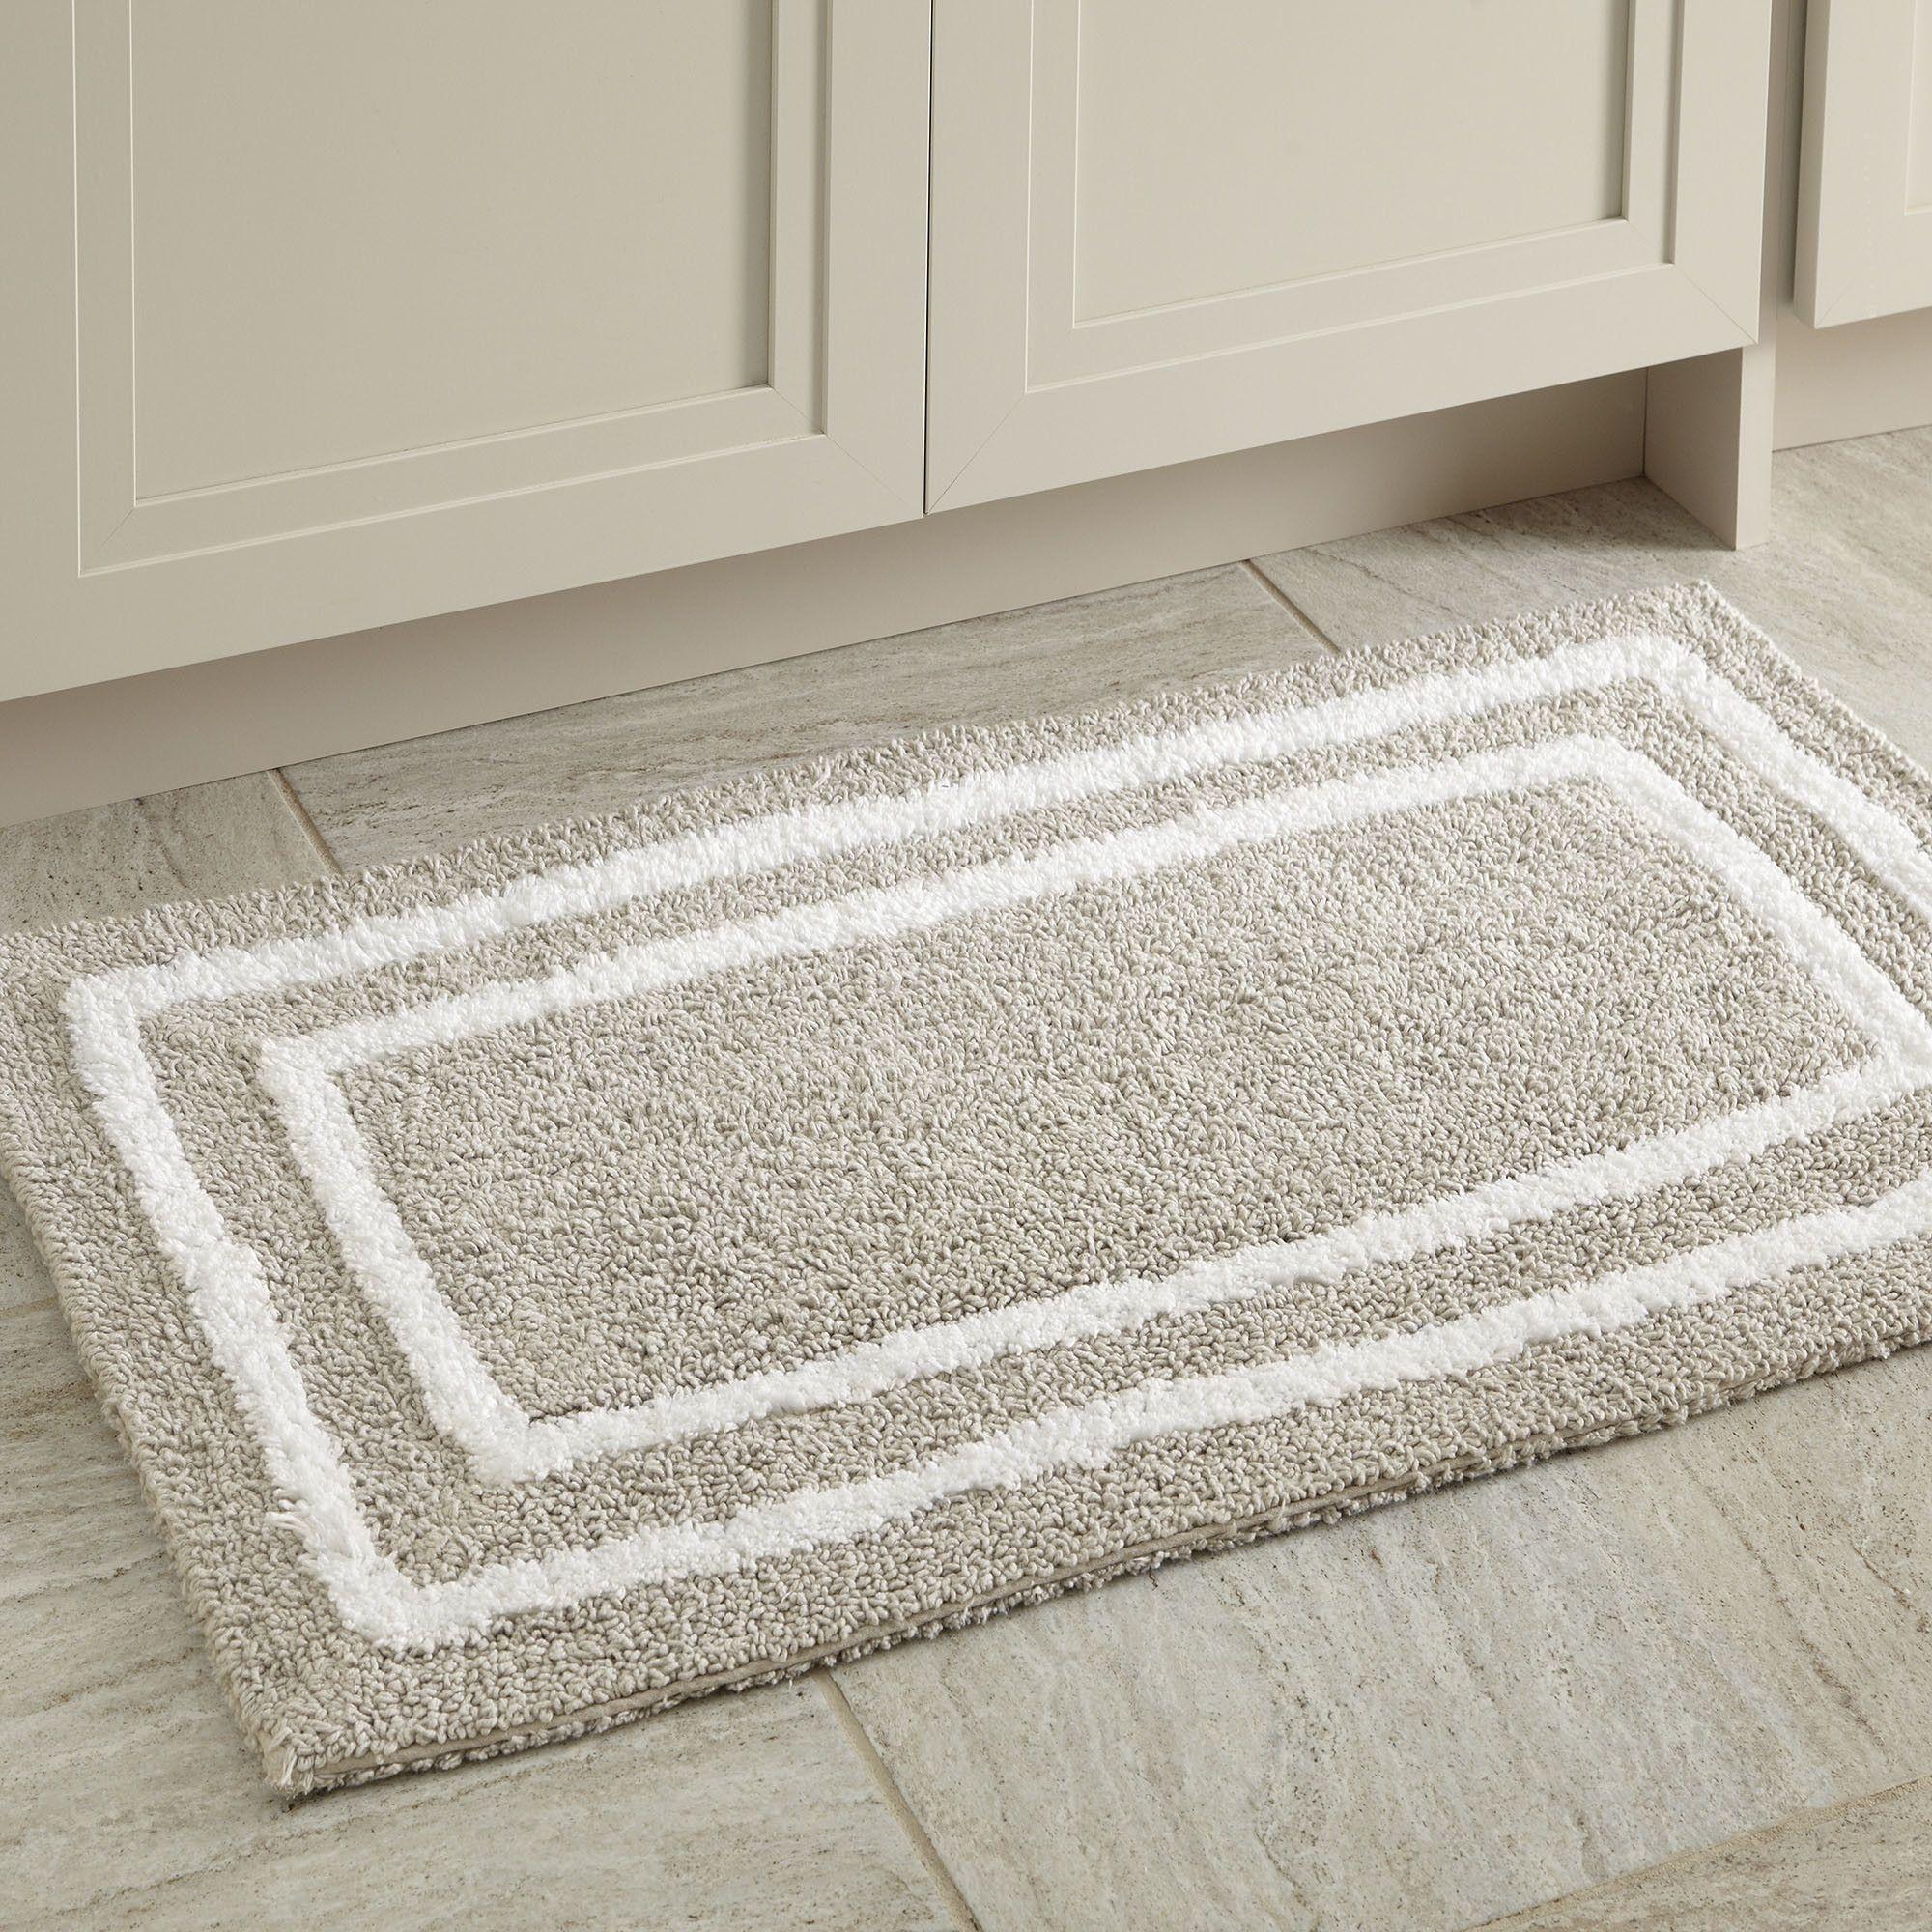 Grey Bathroom Rugs Ideas | Long bathroom Rugs Ideas | Pinterest